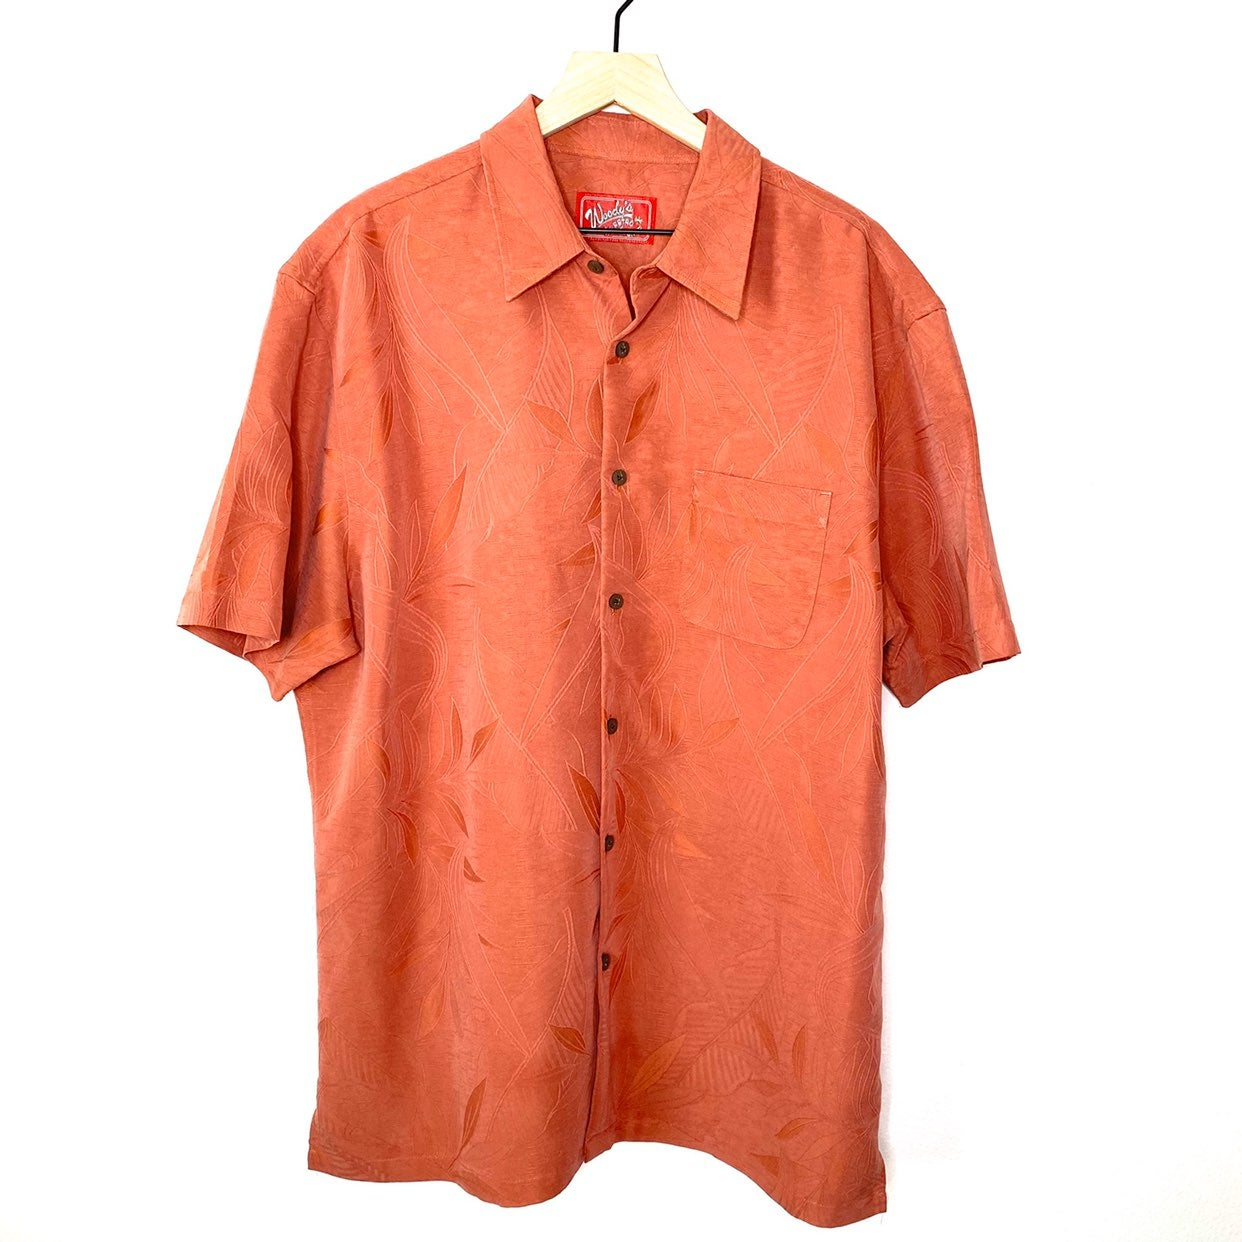 Woody's Retro Lounge Modal Camp Shirt